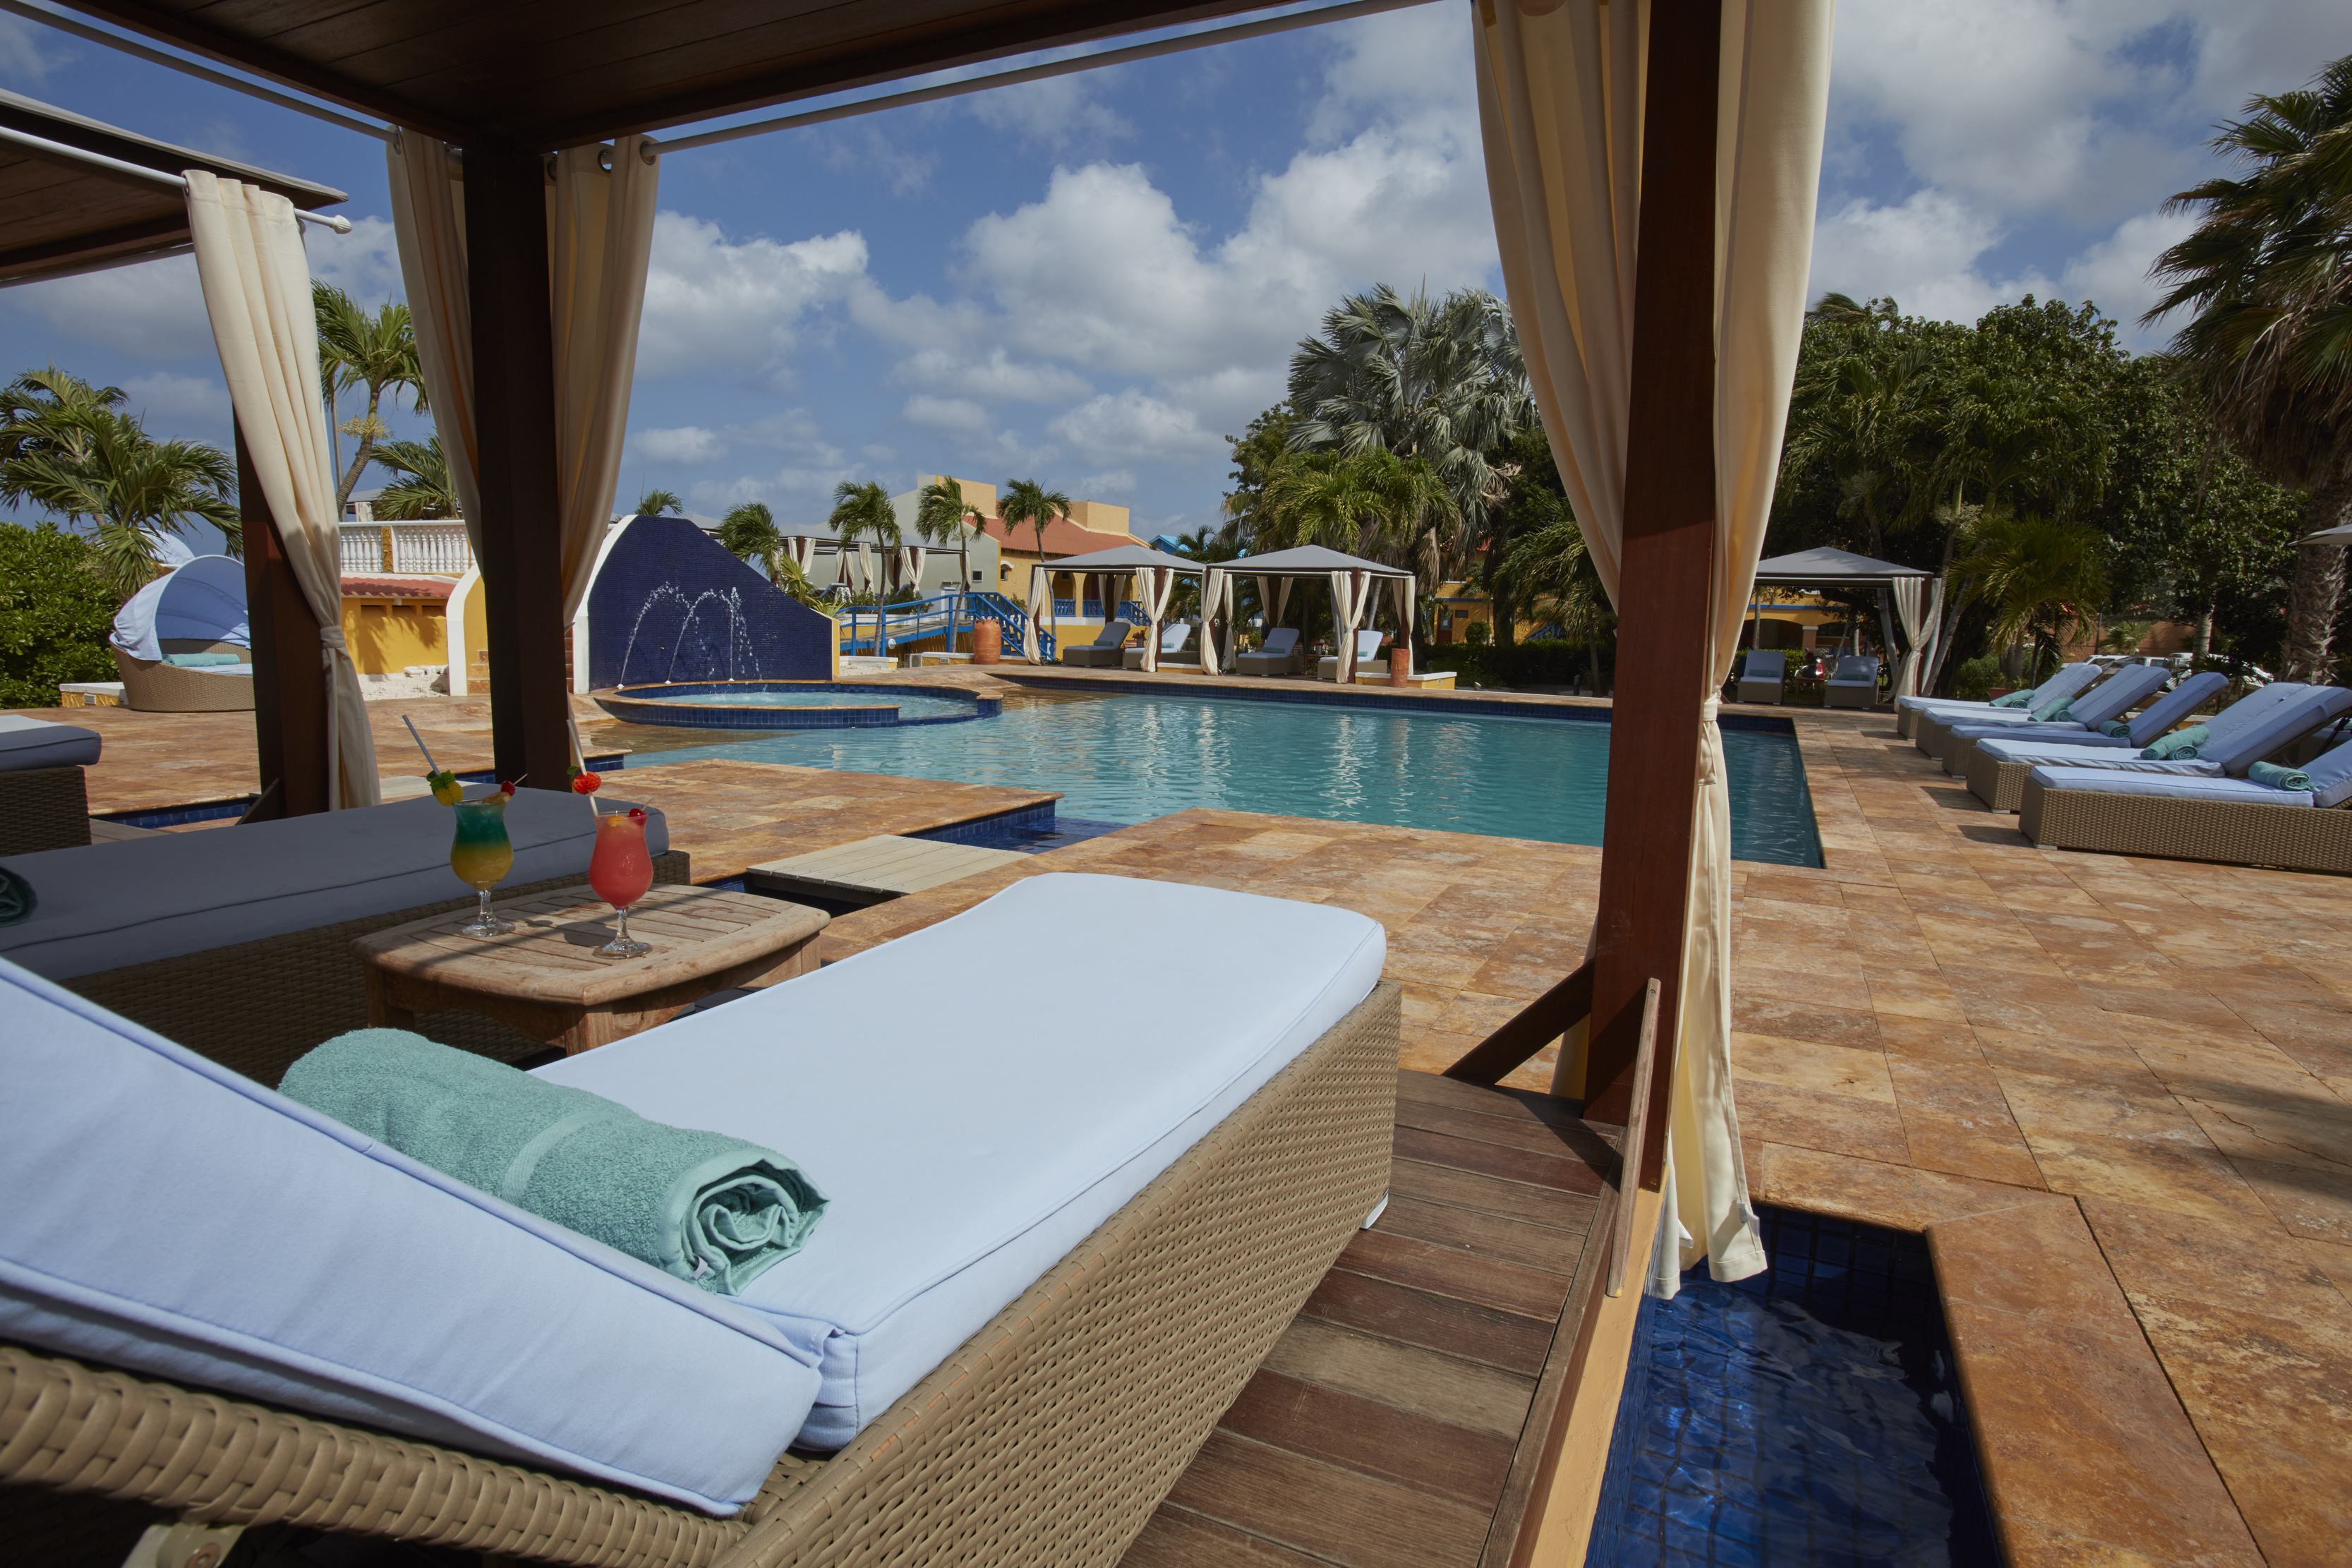 Divi flamingo beach resort casino introduces all - Divi all inclusive resorts ...